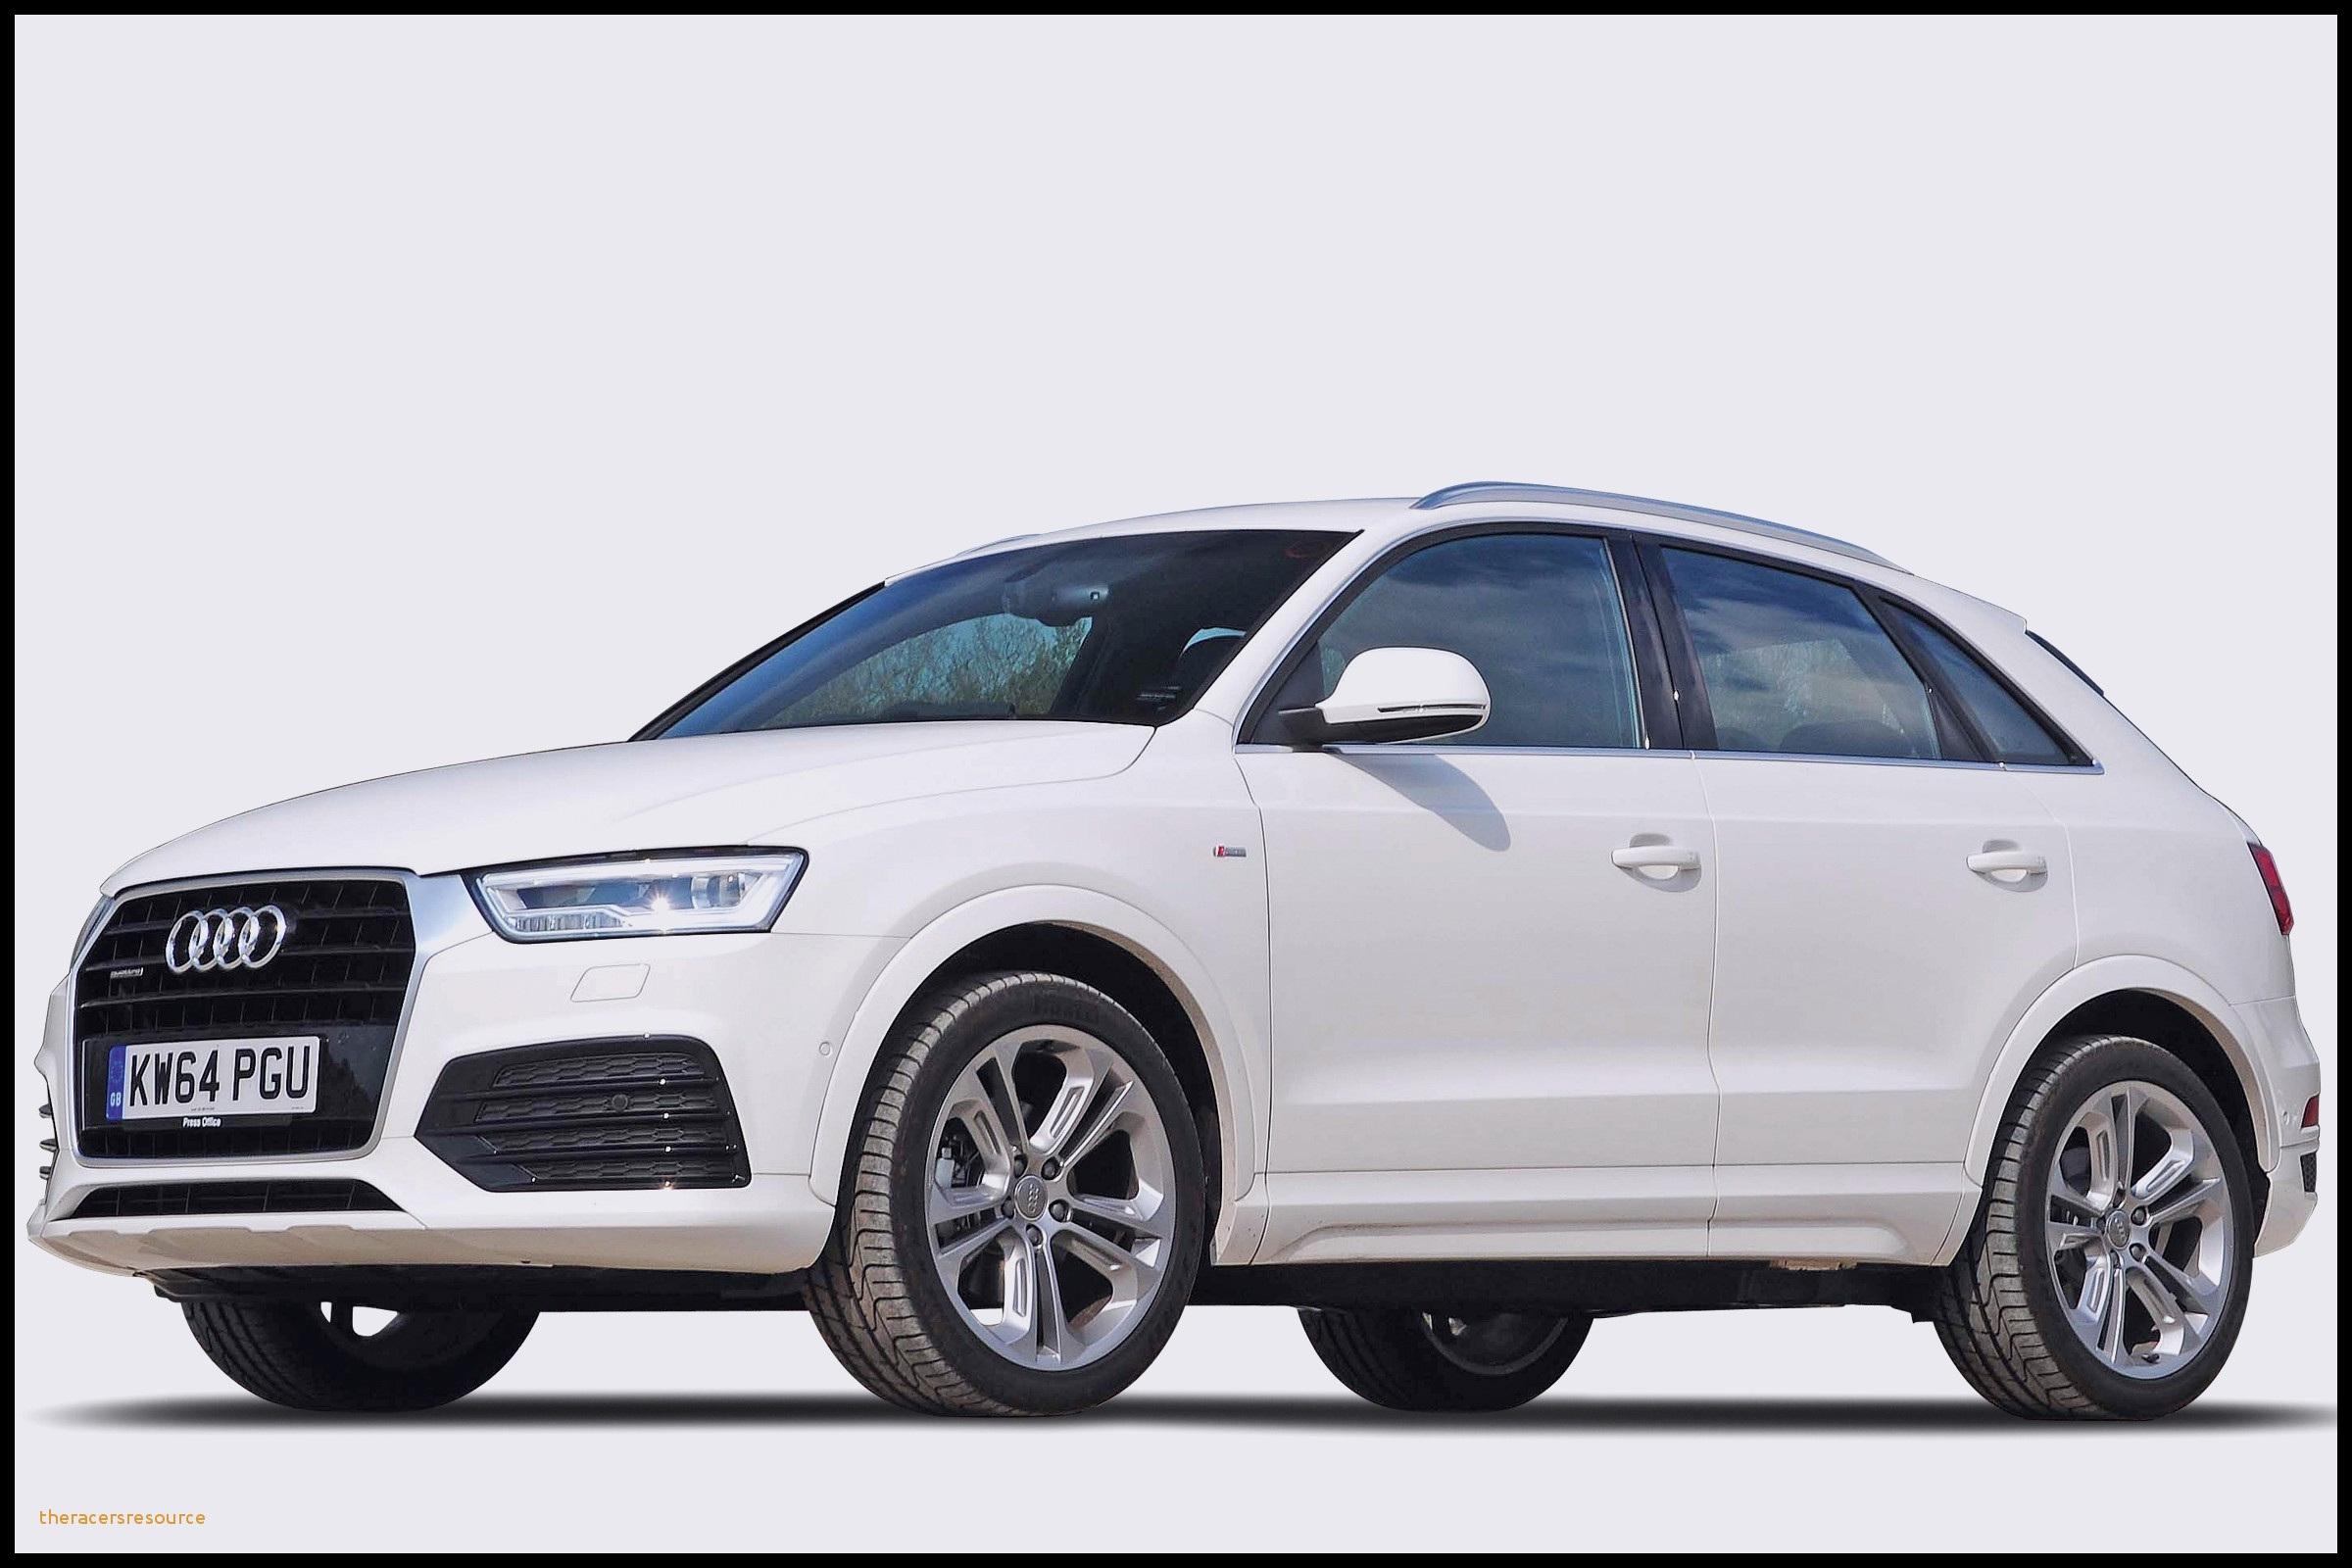 2019 AUDI Q3 SPECS Source · Audi Q3 Specs 2019 The Audi Car